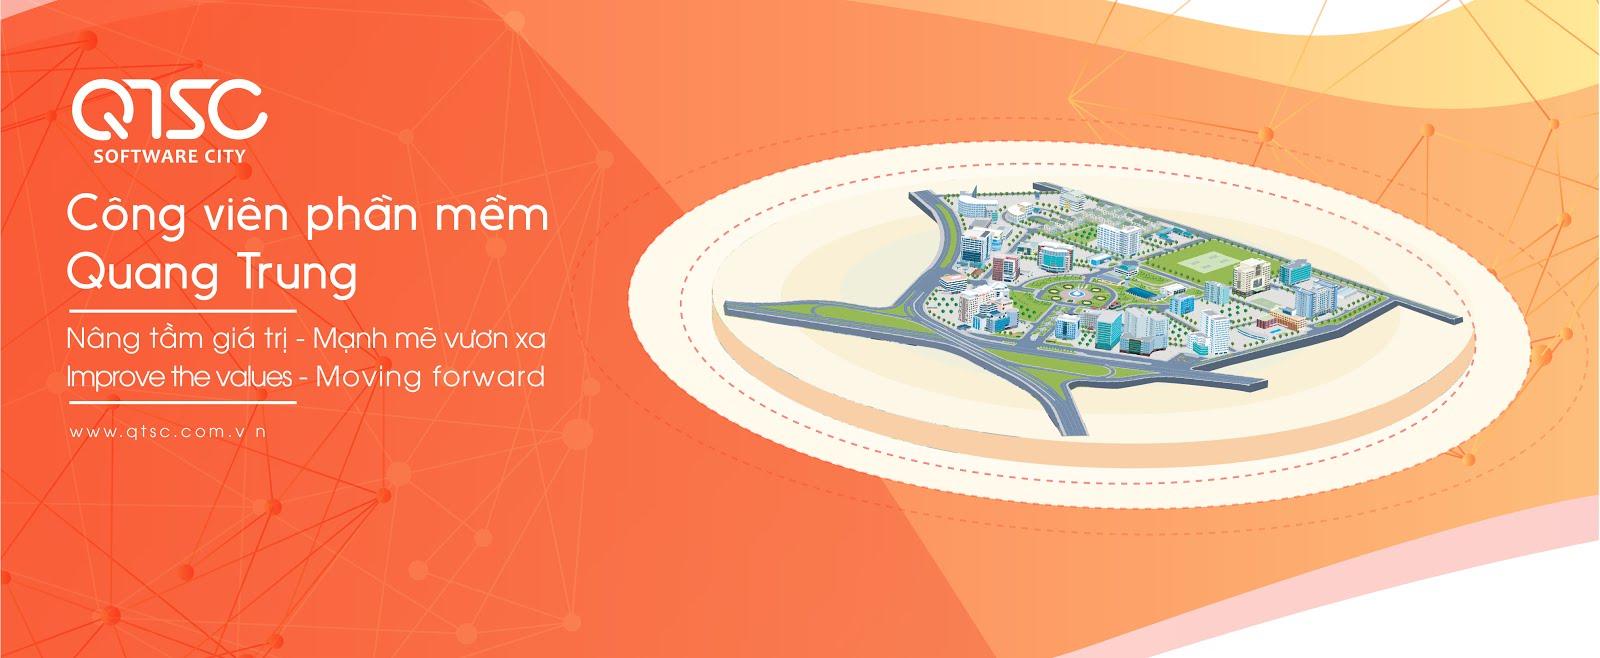 Quang Trung Software City